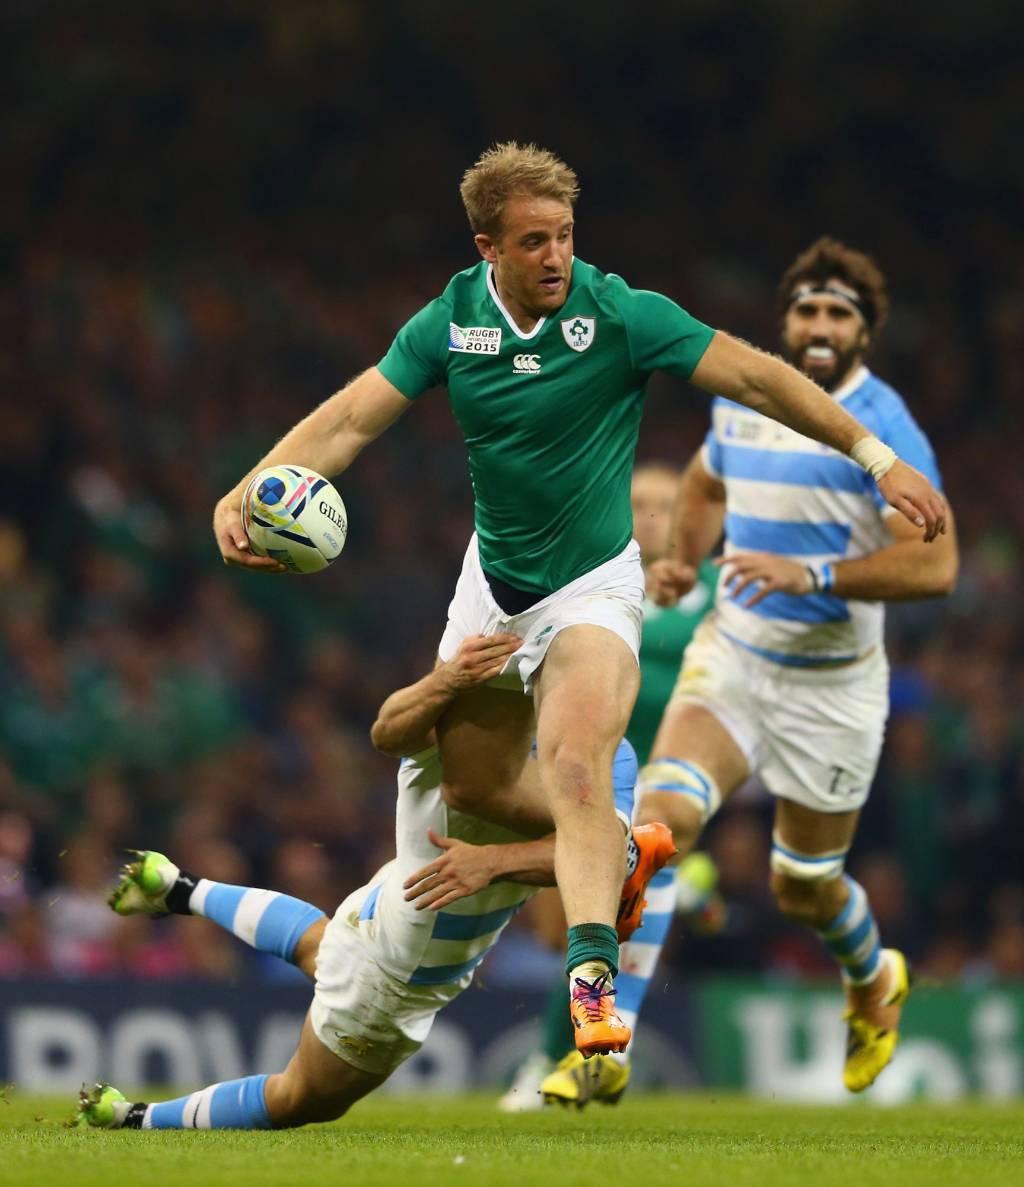 Recap: Rugby World Cup 2015: Ireland Vs Argentina #IREvARG